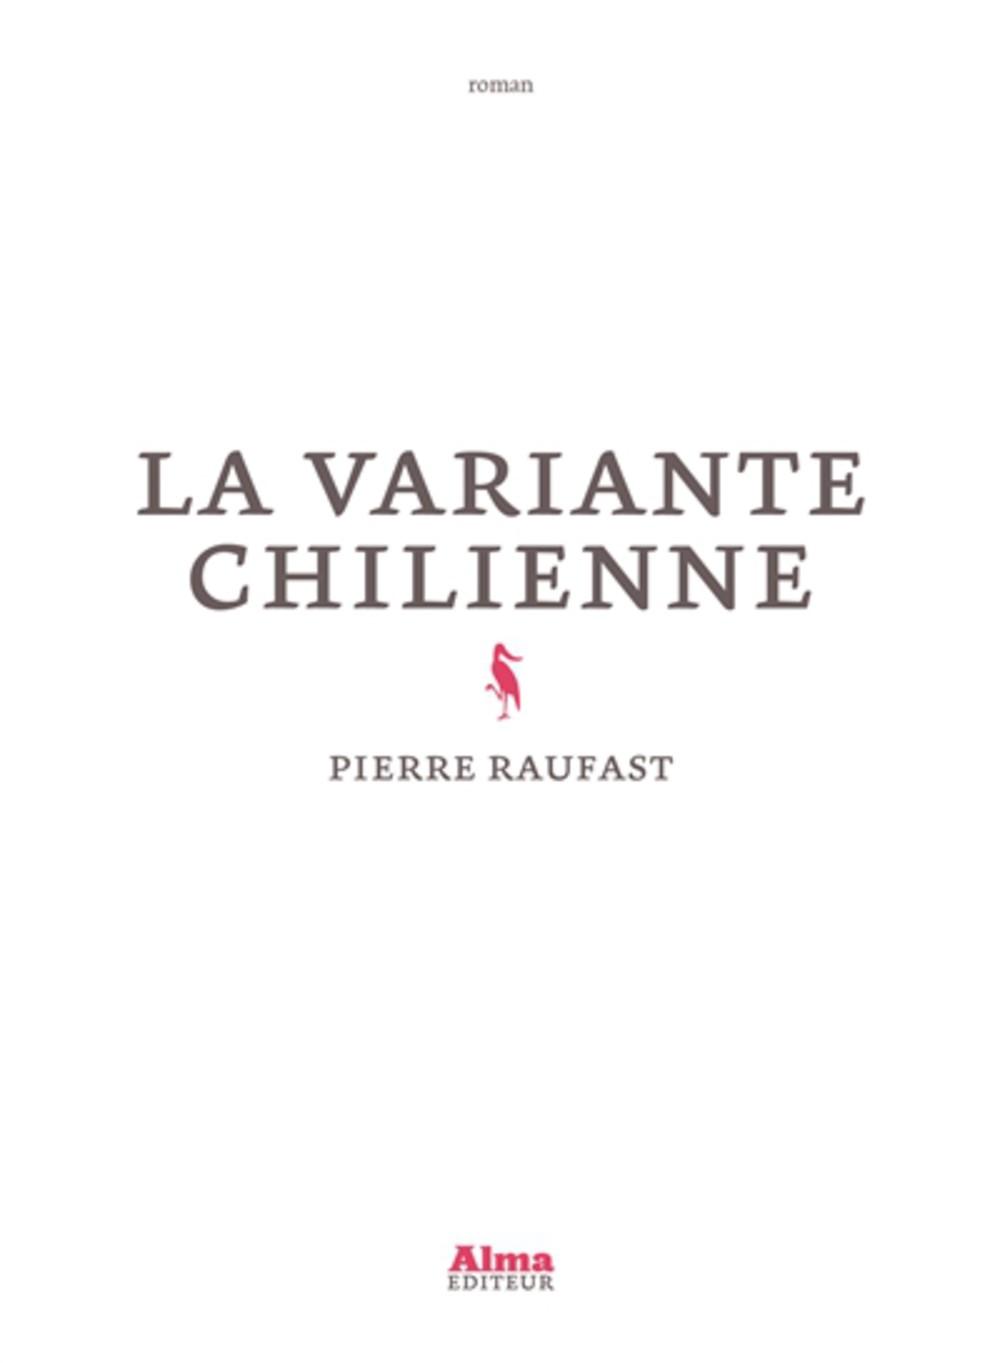 http://itzamna-librairie.blogspot.fr/2015/10/la-variante-chilienne-pierre-raufast.html